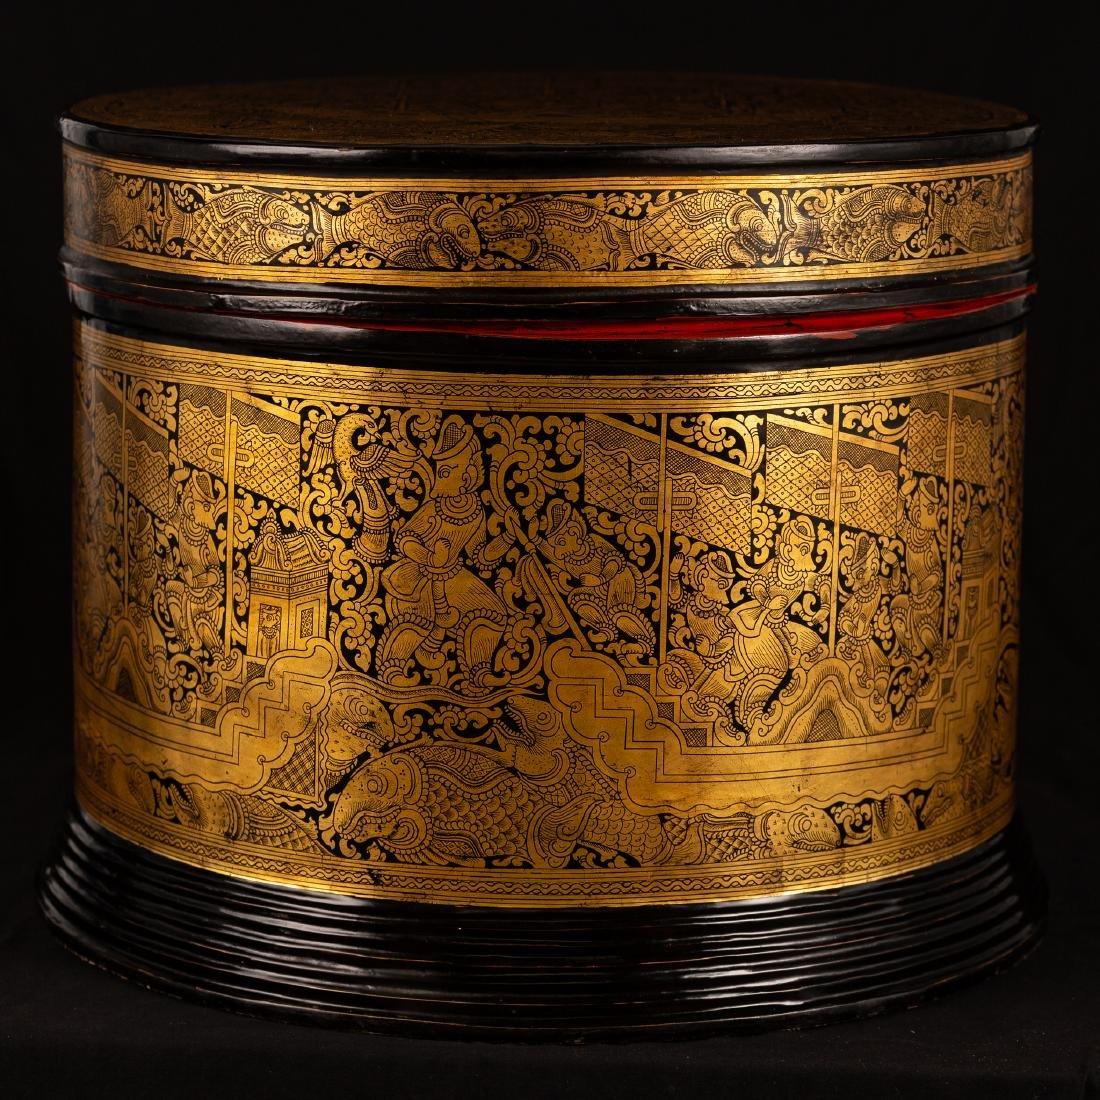 19th Century Burmese Lacquerware Monks Robe Box - 2